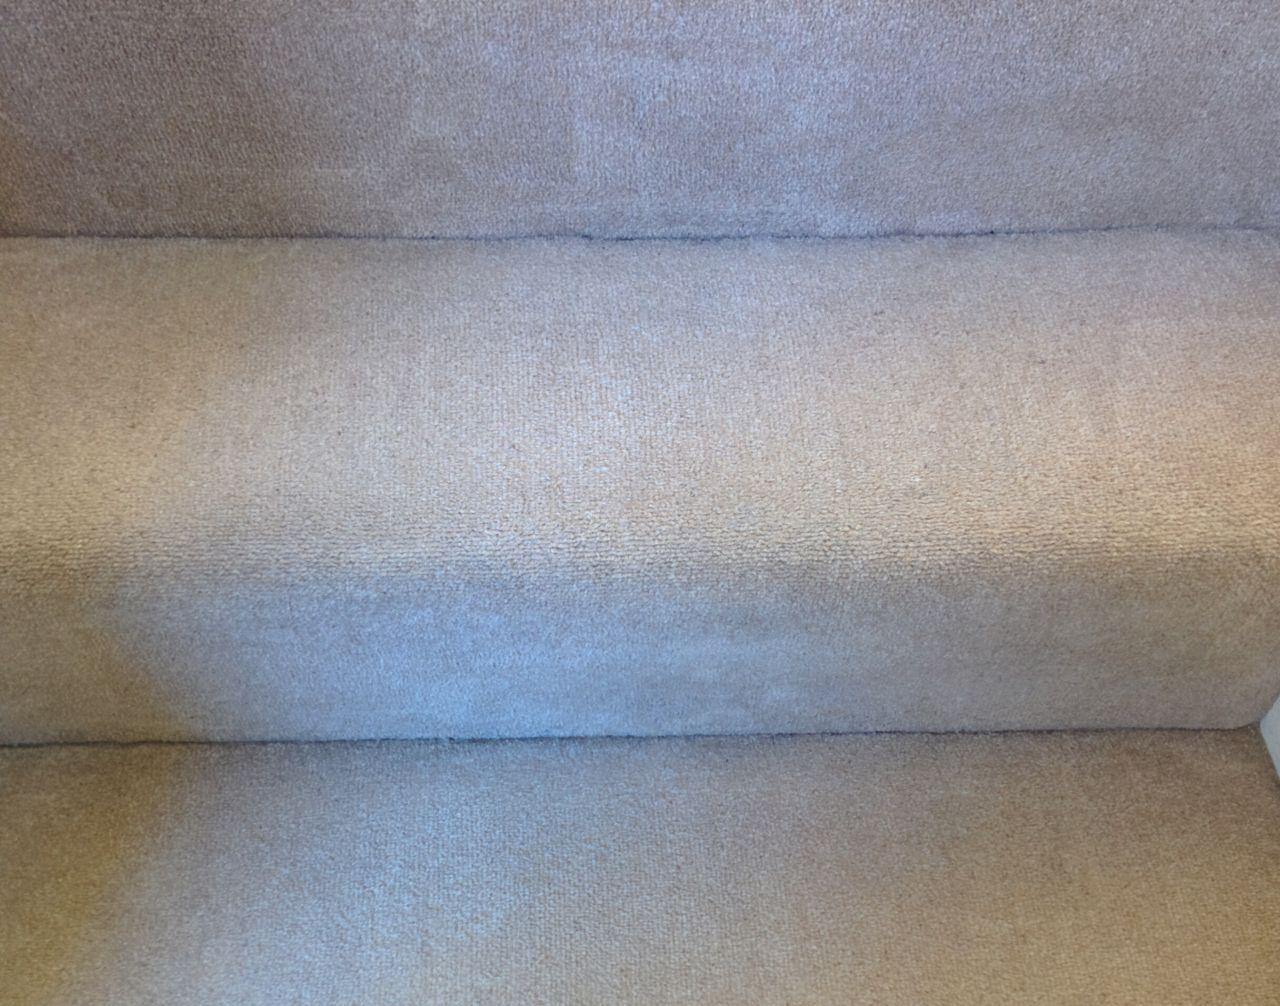 W8 carpet cleaners Kensington